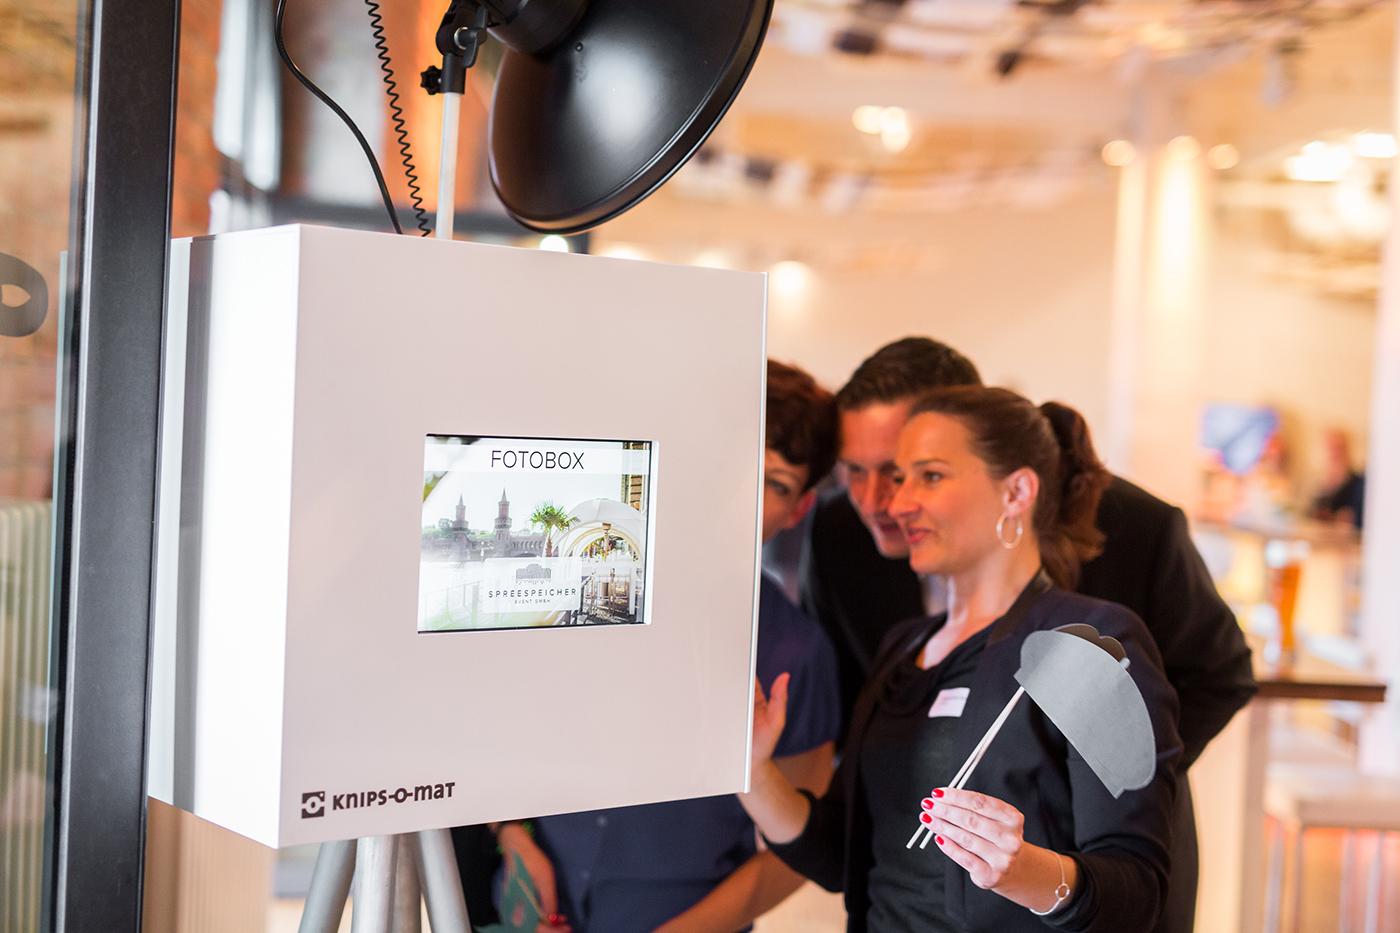 fotobox premium inkl sofortbilderdruck knips o mat. Black Bedroom Furniture Sets. Home Design Ideas